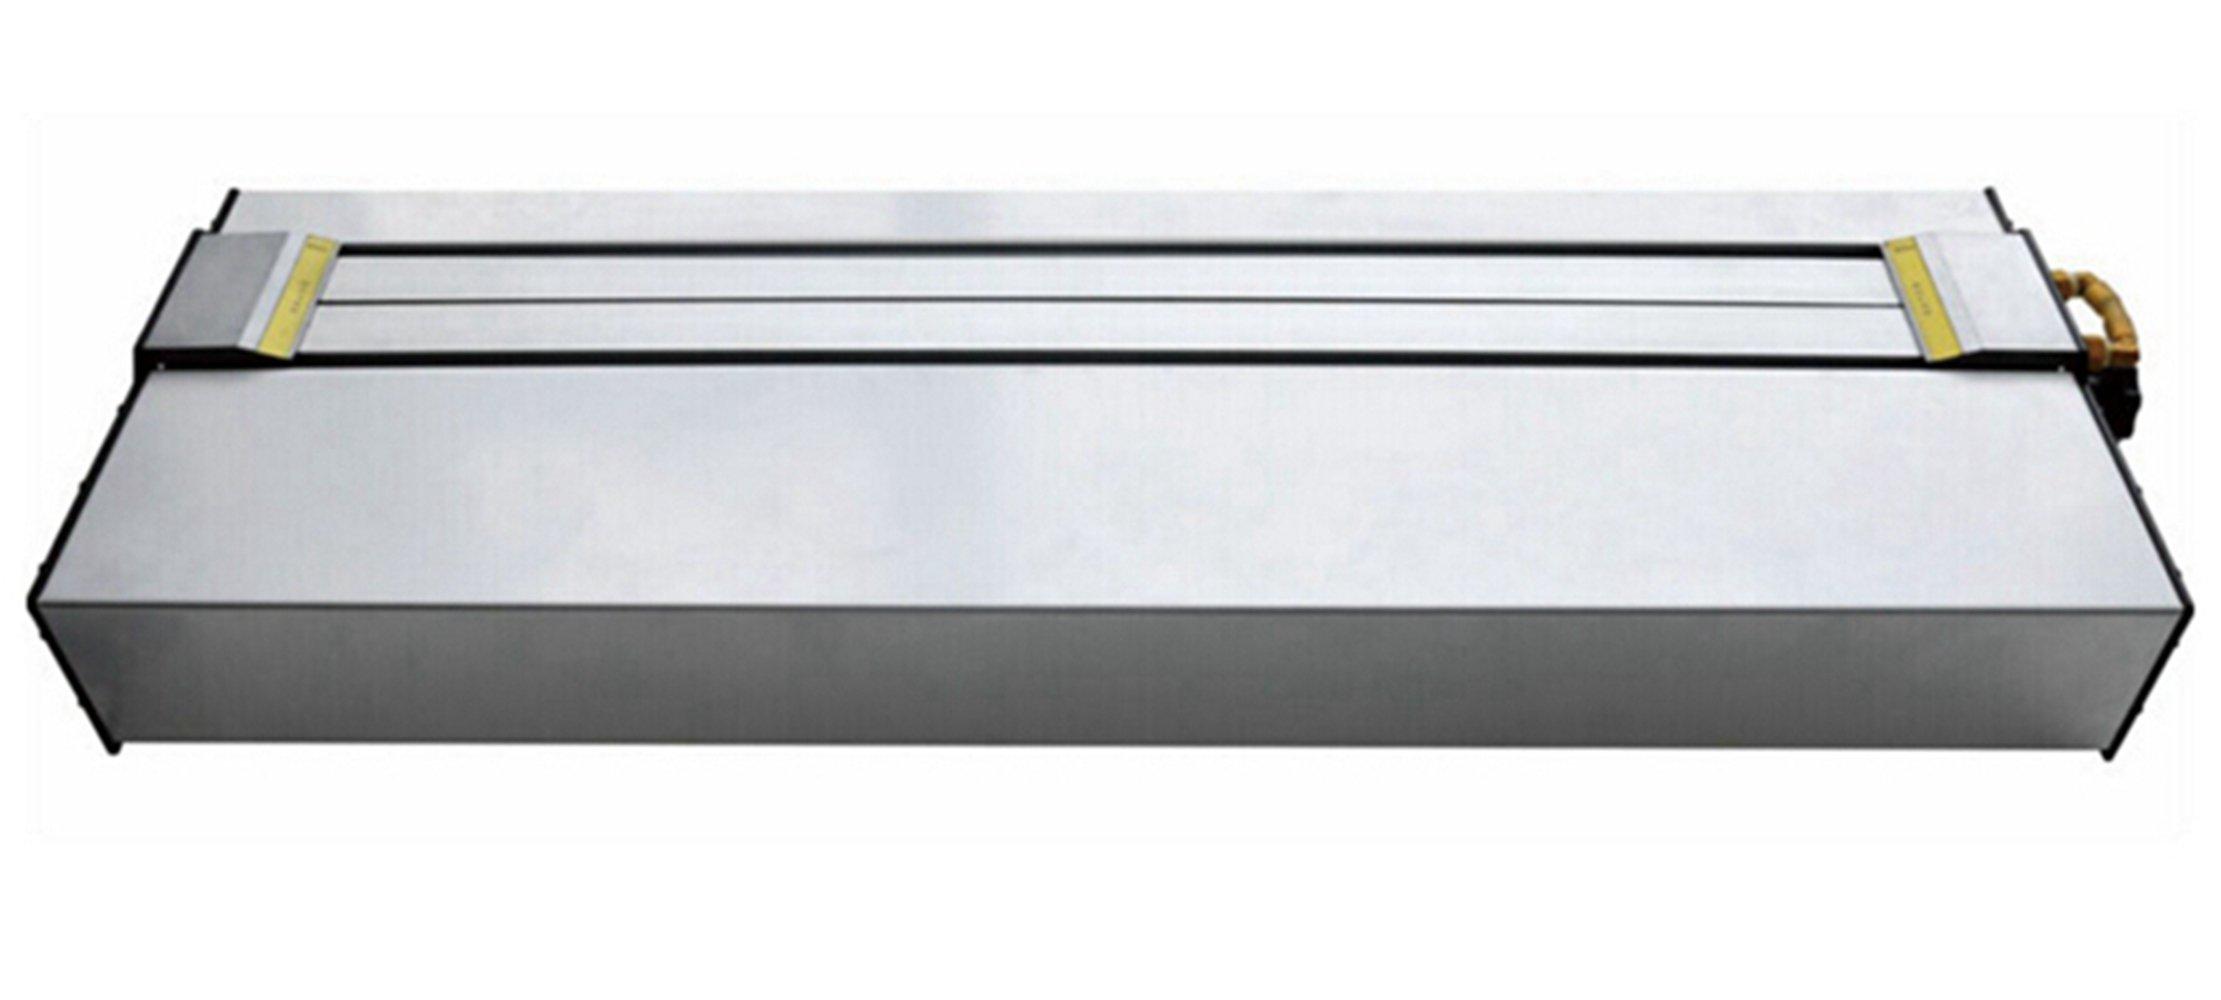 Welljun 1300mm Acrylic Plastic PVC Bending Machine with Infrared Ray Calibration 220V